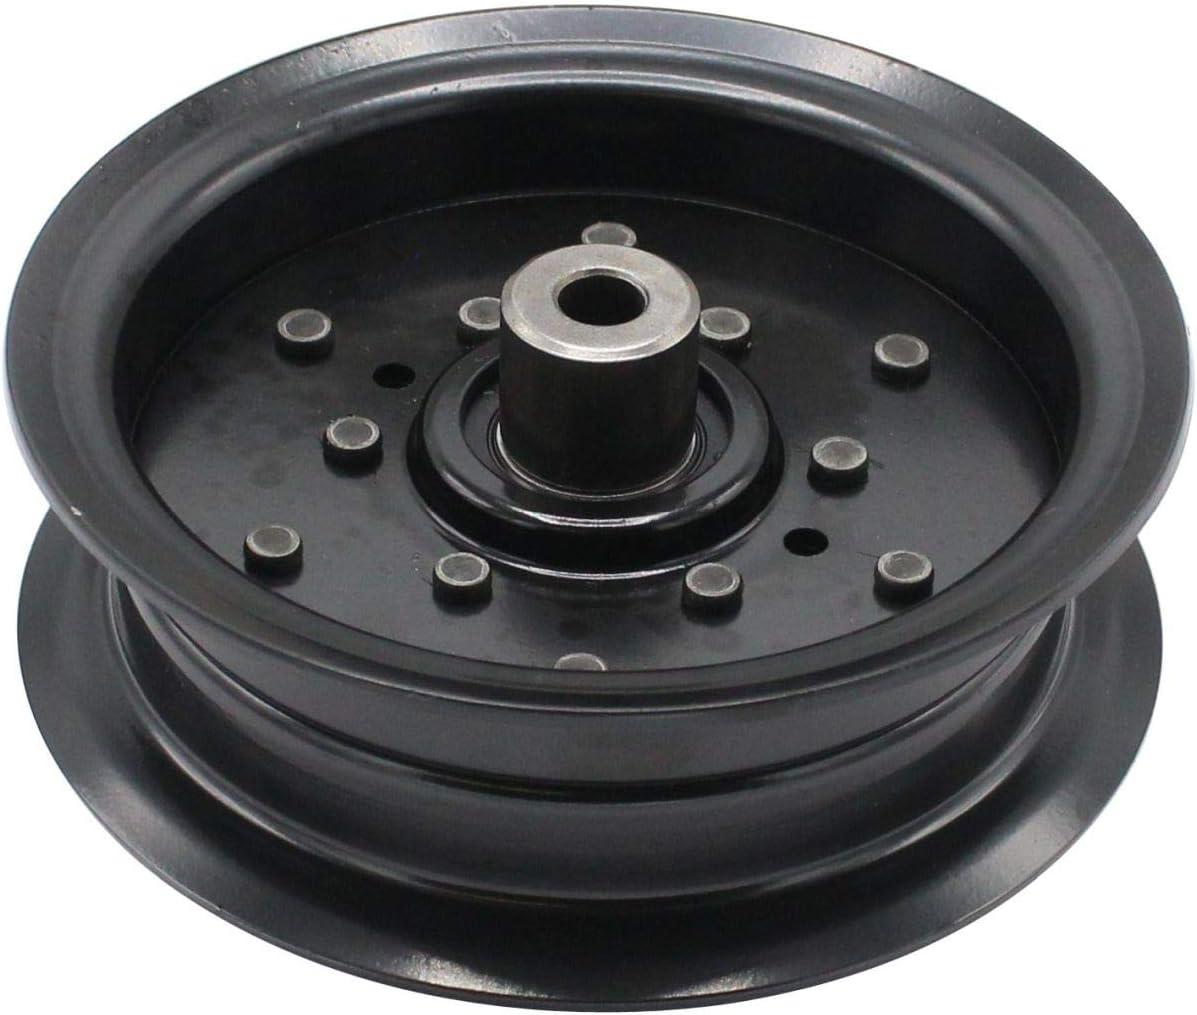 Spannrolle M/ähwerk 136,52mm passend Husqvarna YTH23V42 96043014700 Rasentraktor